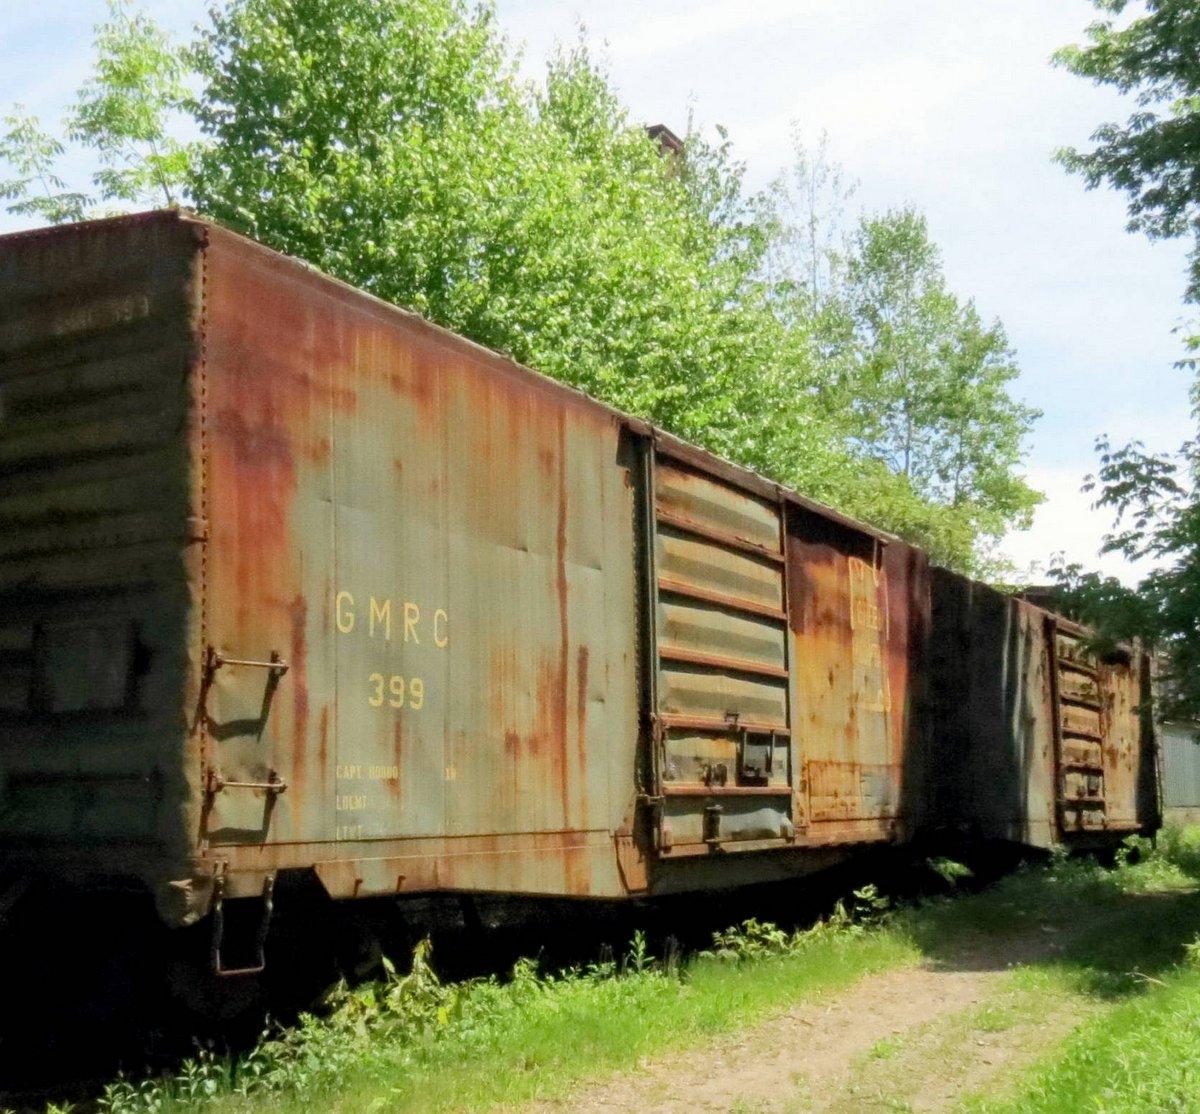 4. Boxcars